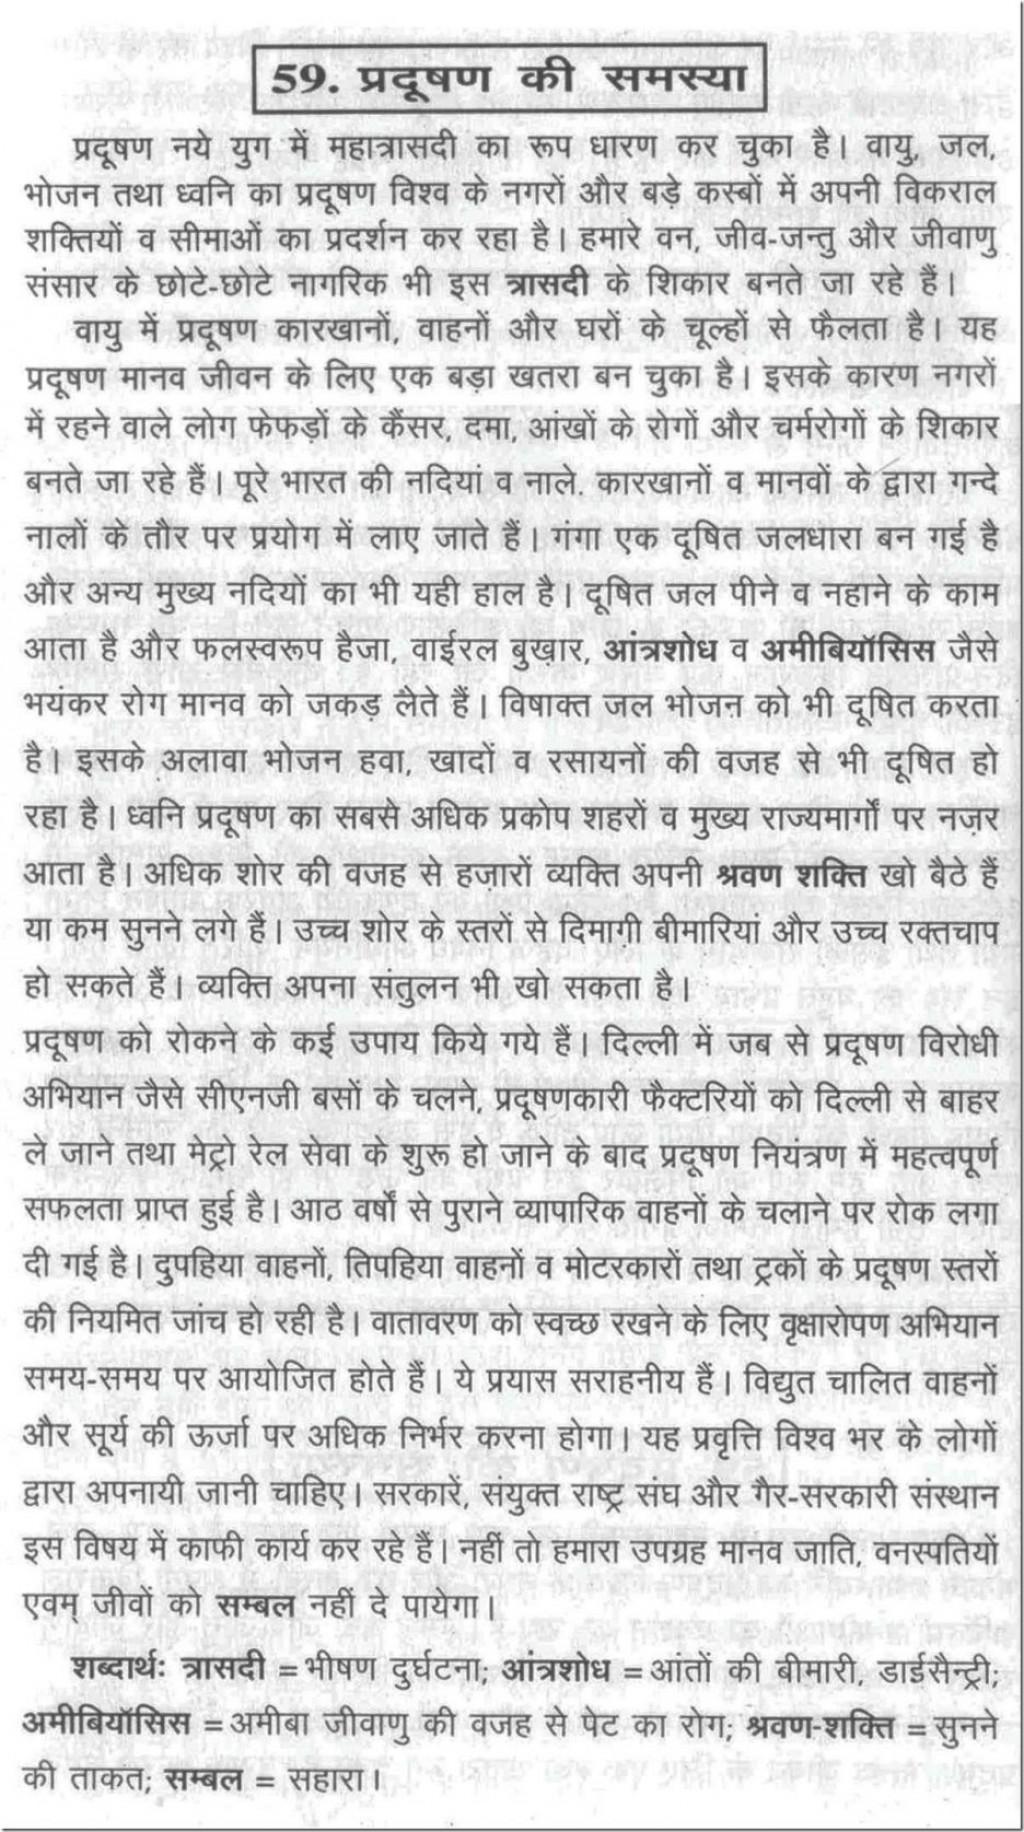 016 Essay Example Save Water Wikipedia Thumb Essays On In Hindi Language Marathi Punjabi For Class And Electricity Awful Life Tamil Gujarati Large